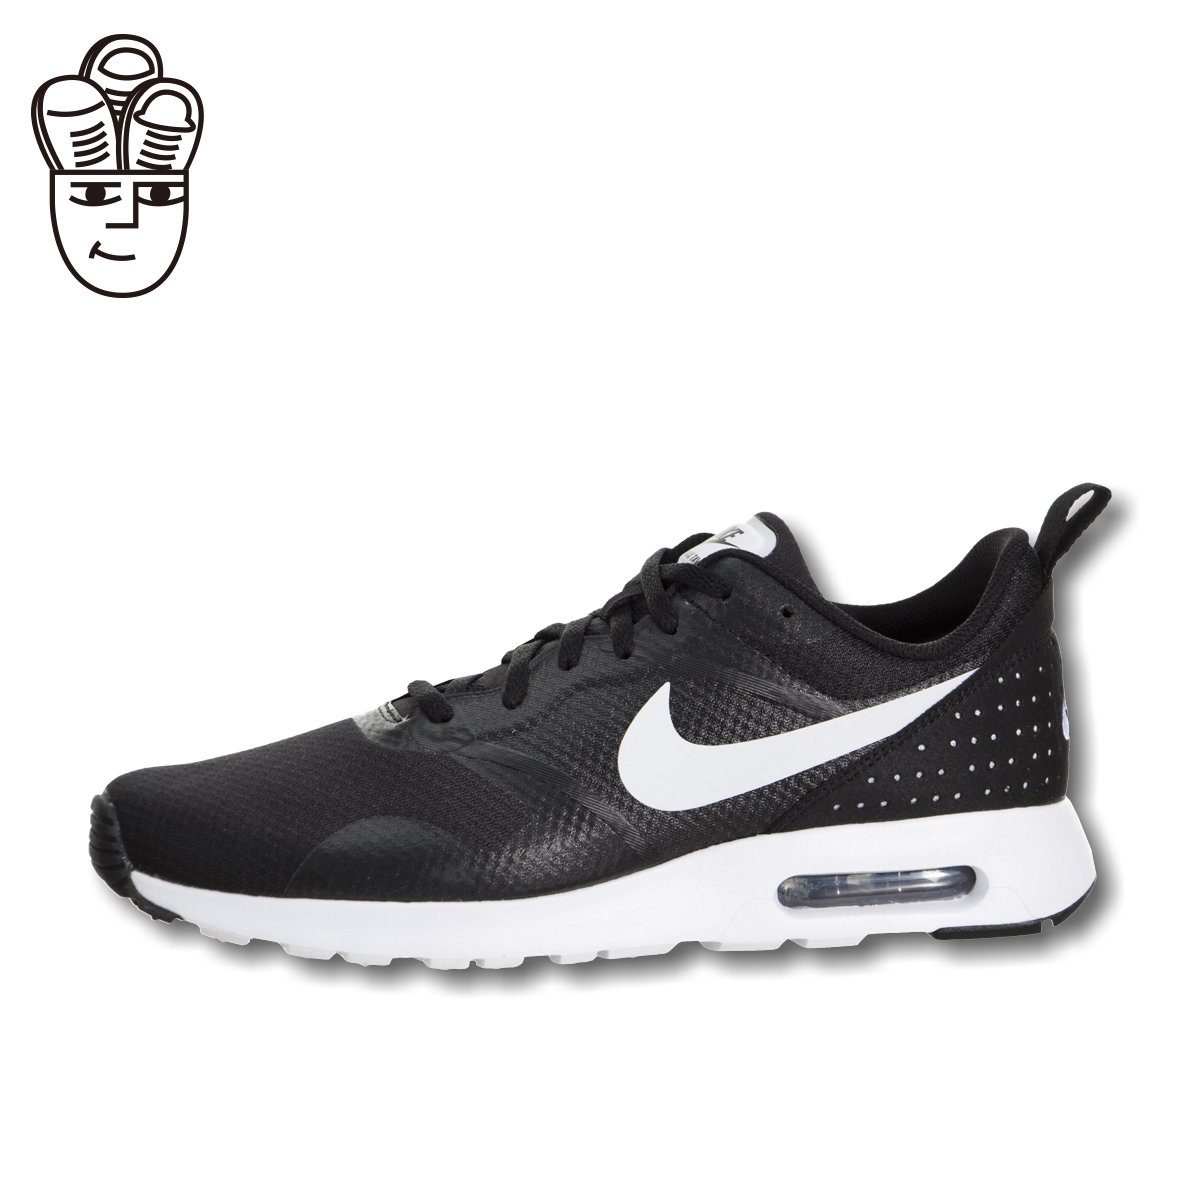 wholesale dealer fdadd db7b2 Get Quotations · Nike nike air max tavas men retro air cushion running  shoes sports shoes 705149